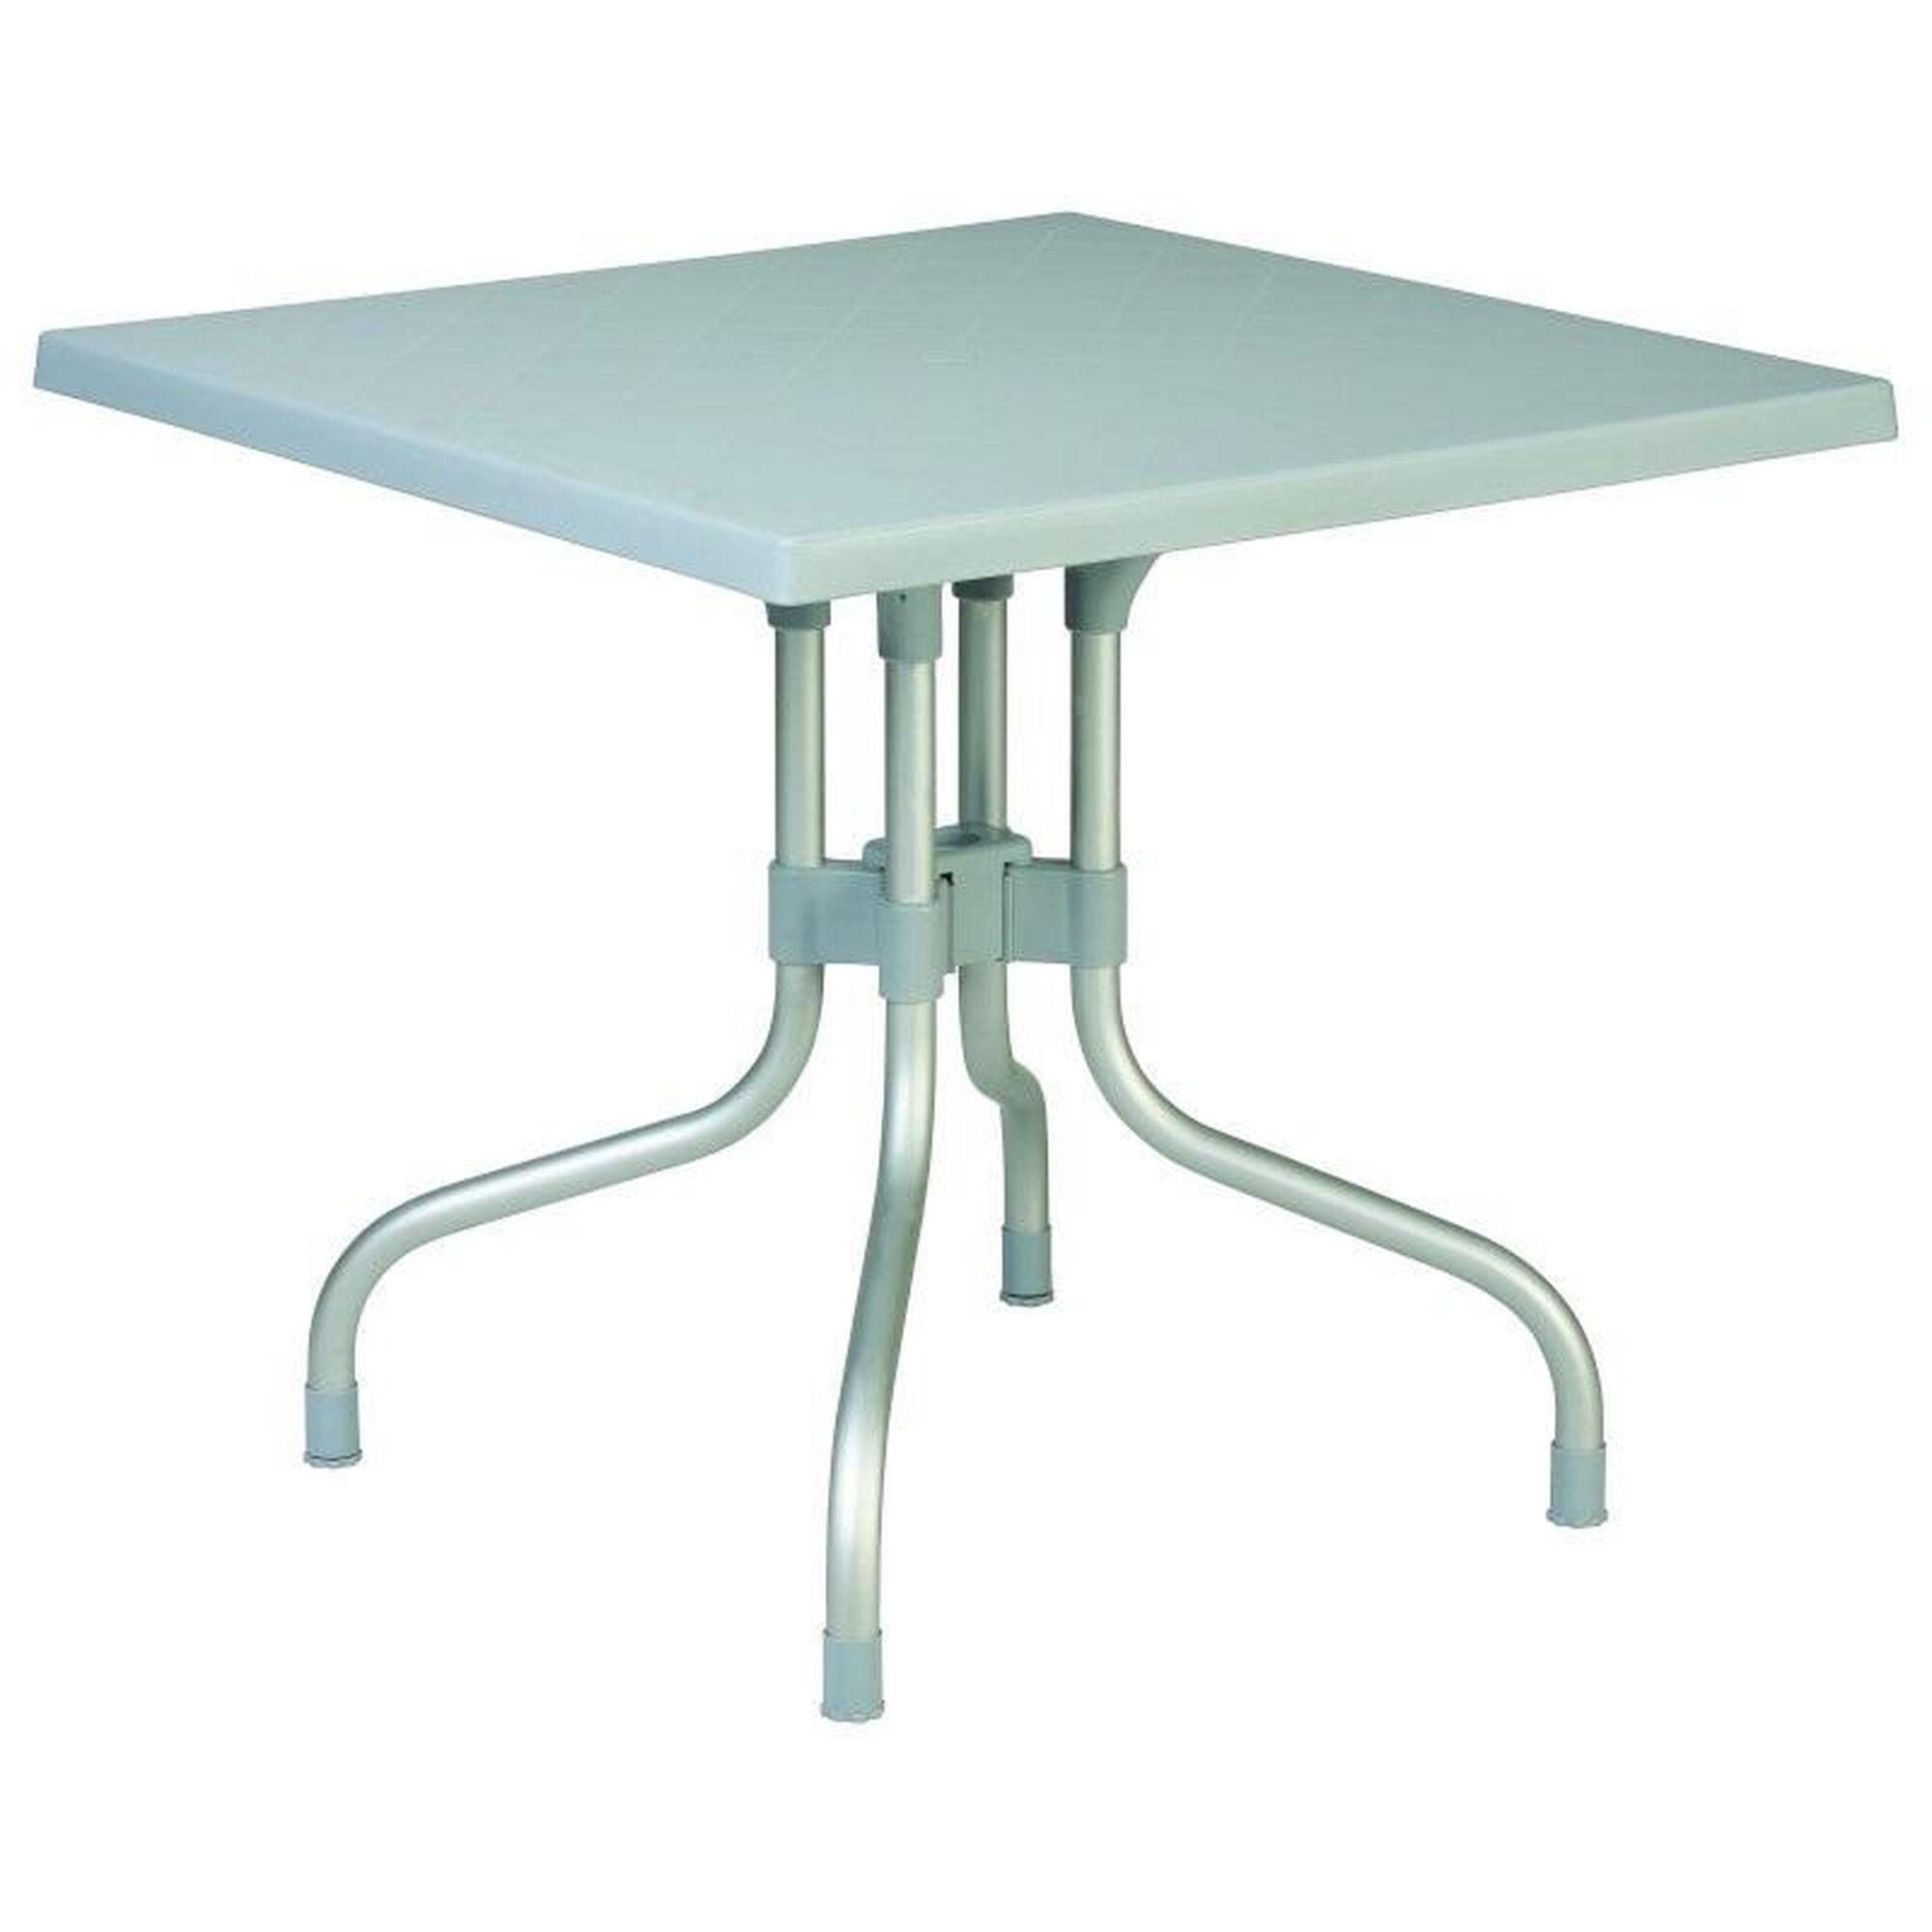 silver folding dining table isp770 sil. Black Bedroom Furniture Sets. Home Design Ideas